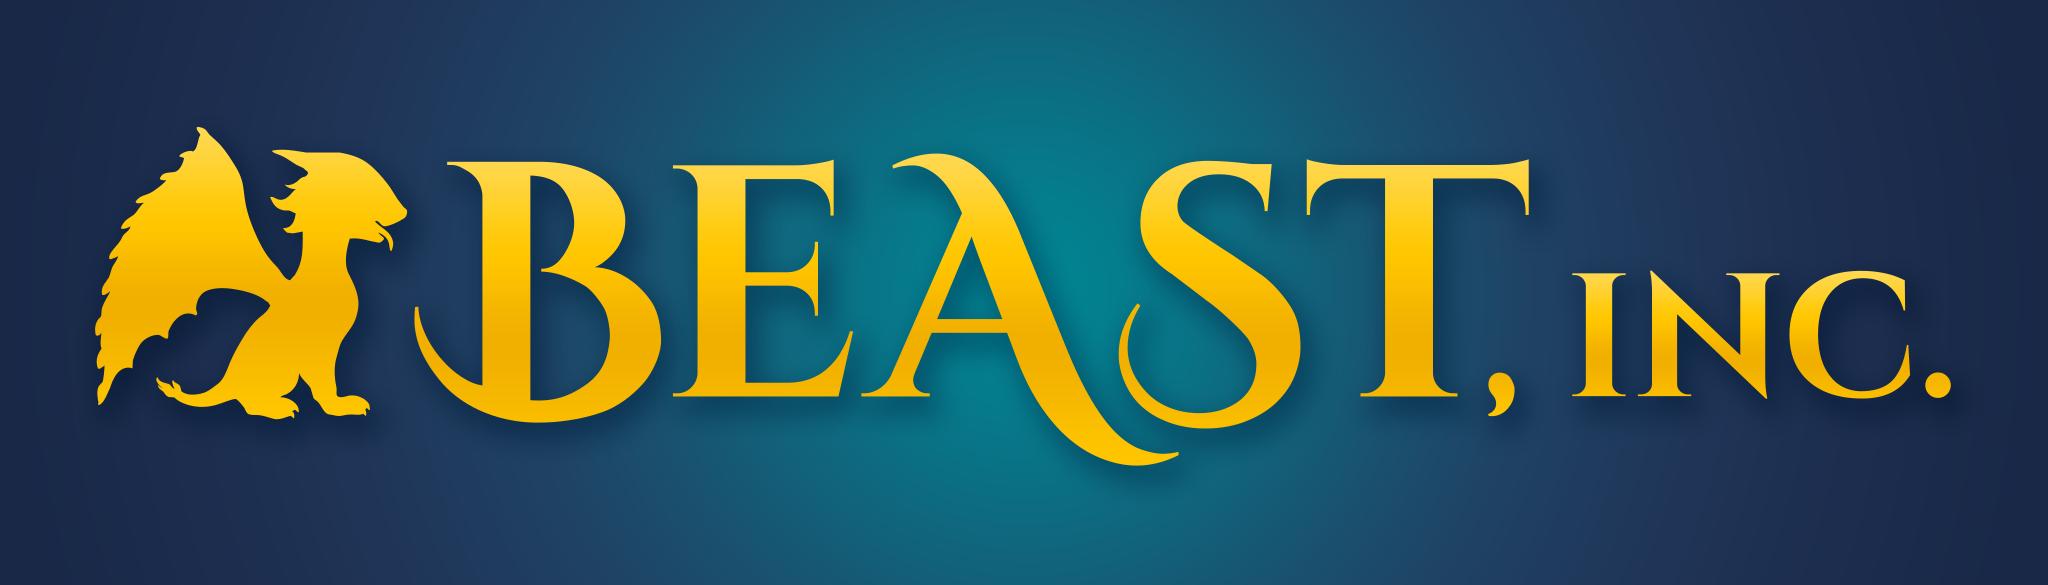 beast_inc_text_logo.png